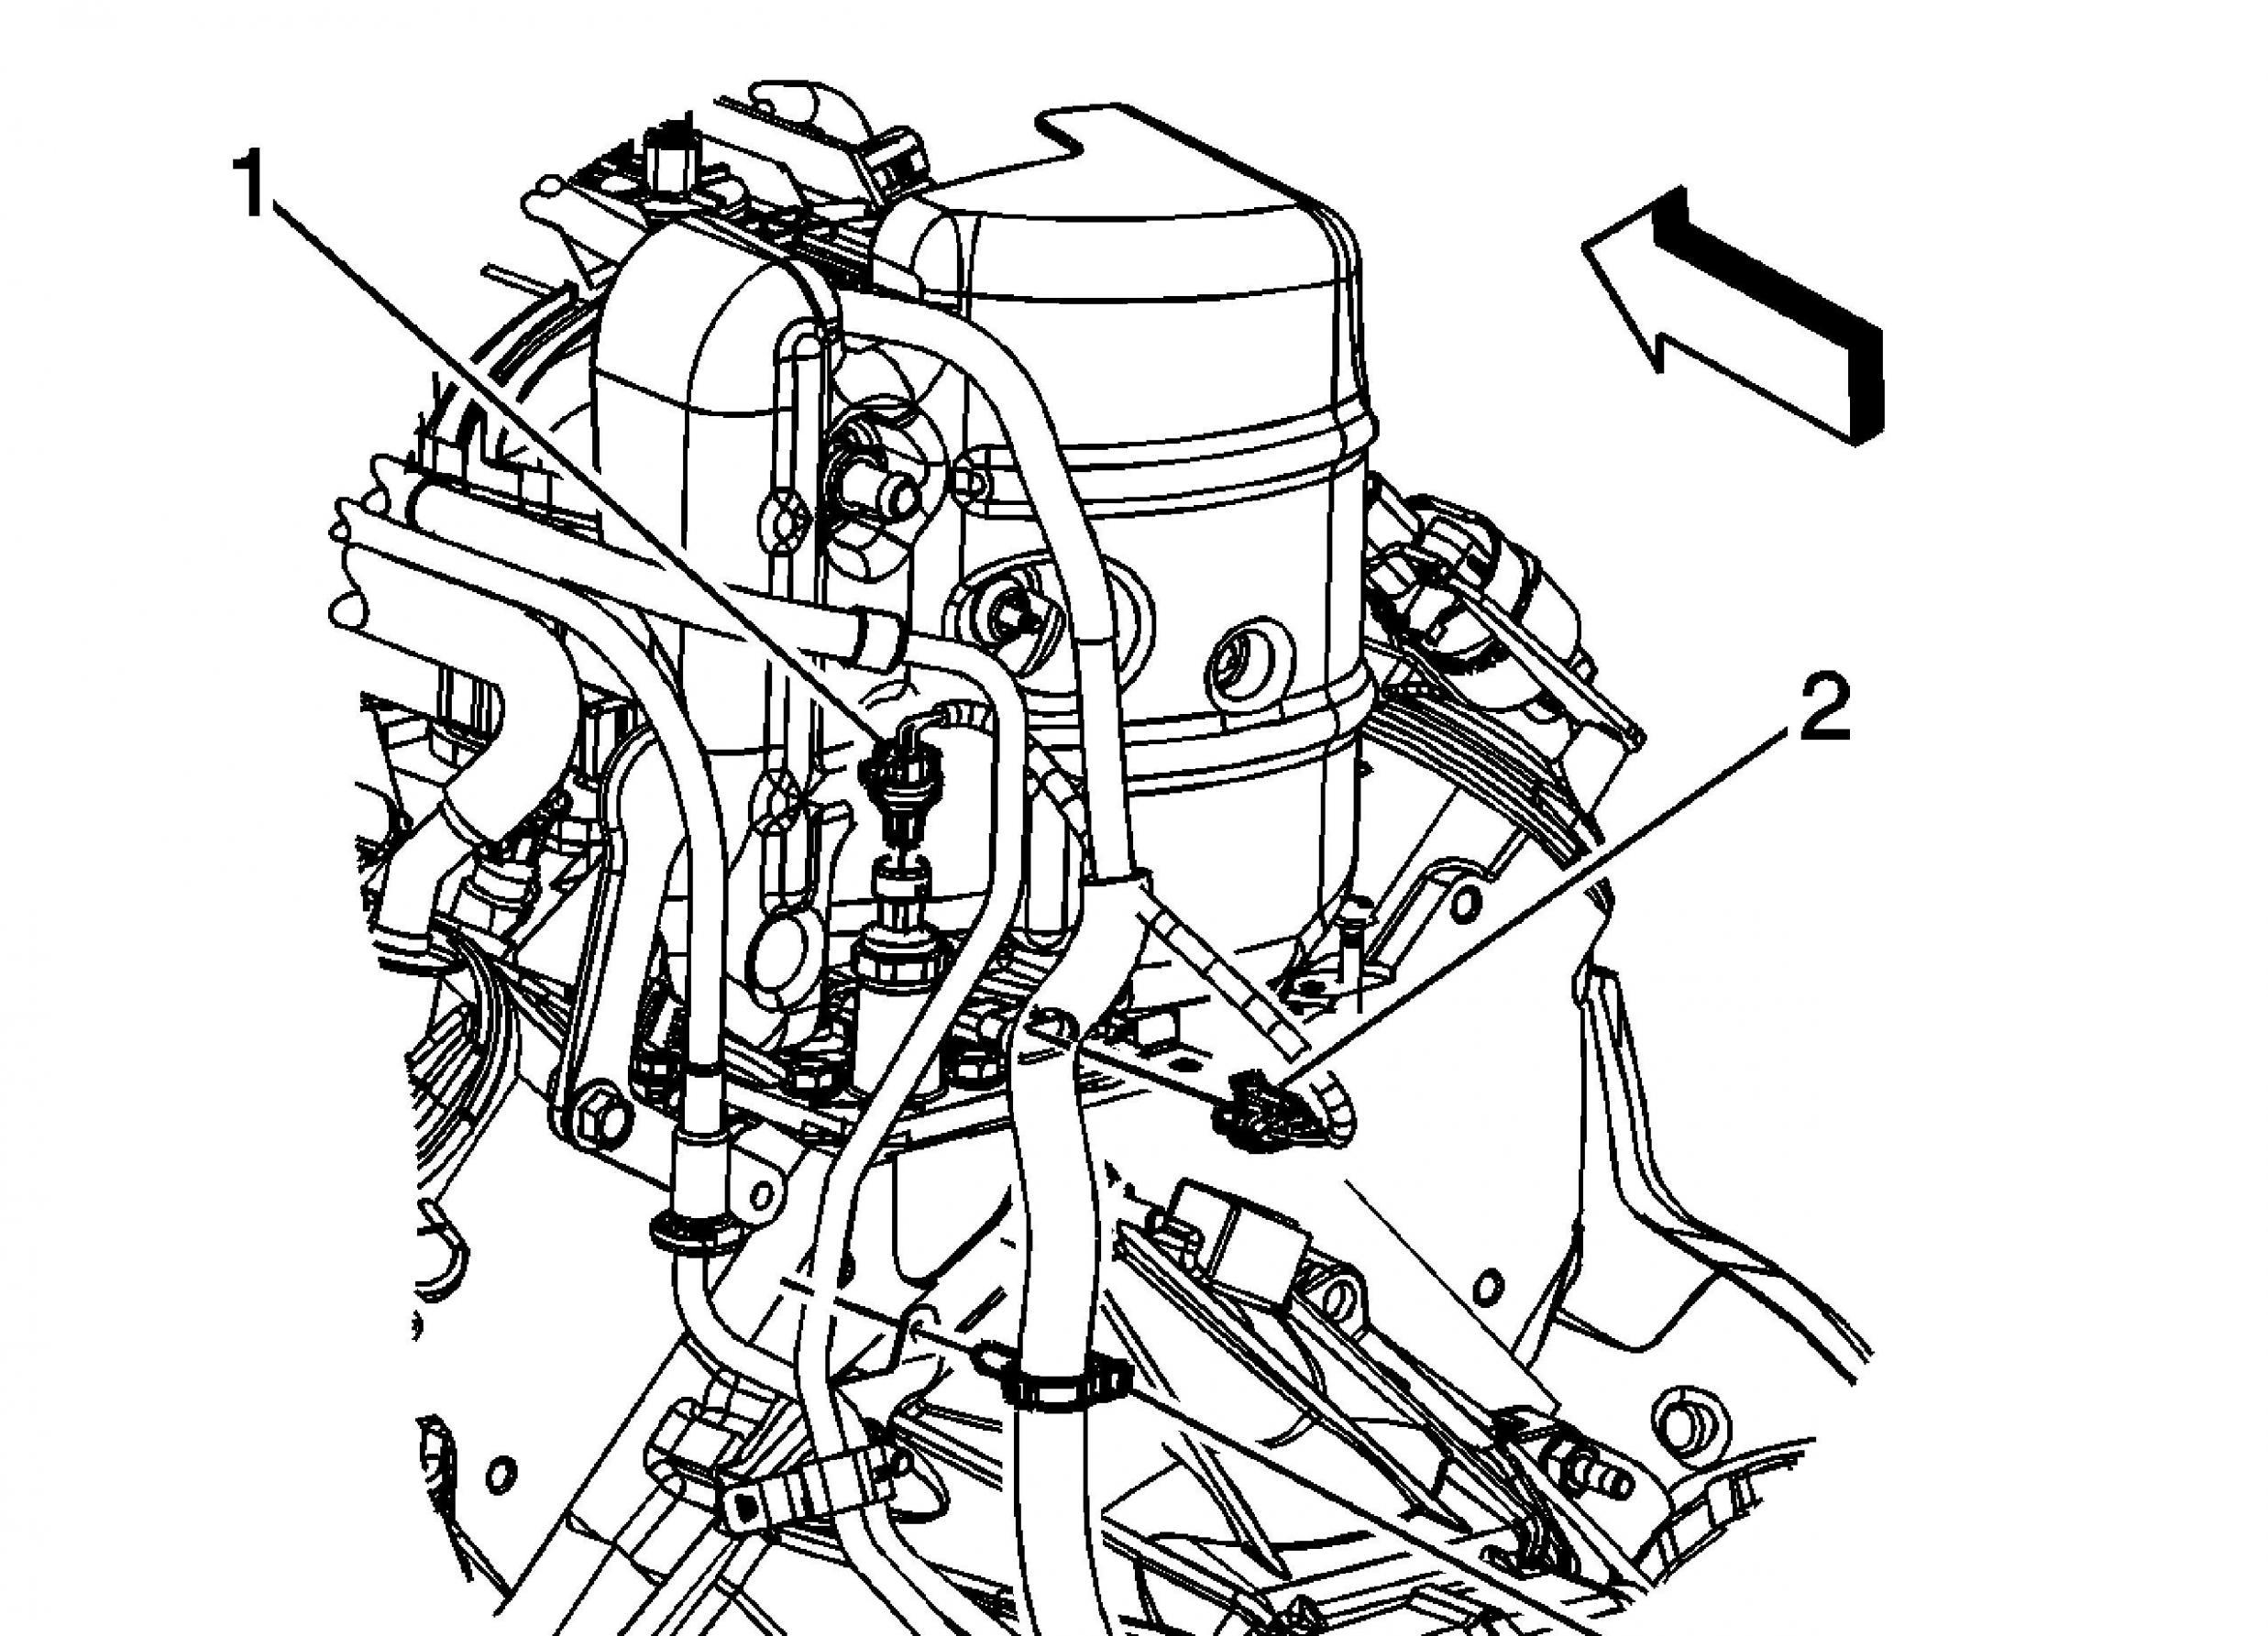 1993 Chevy S10 Fuse Box Diagram